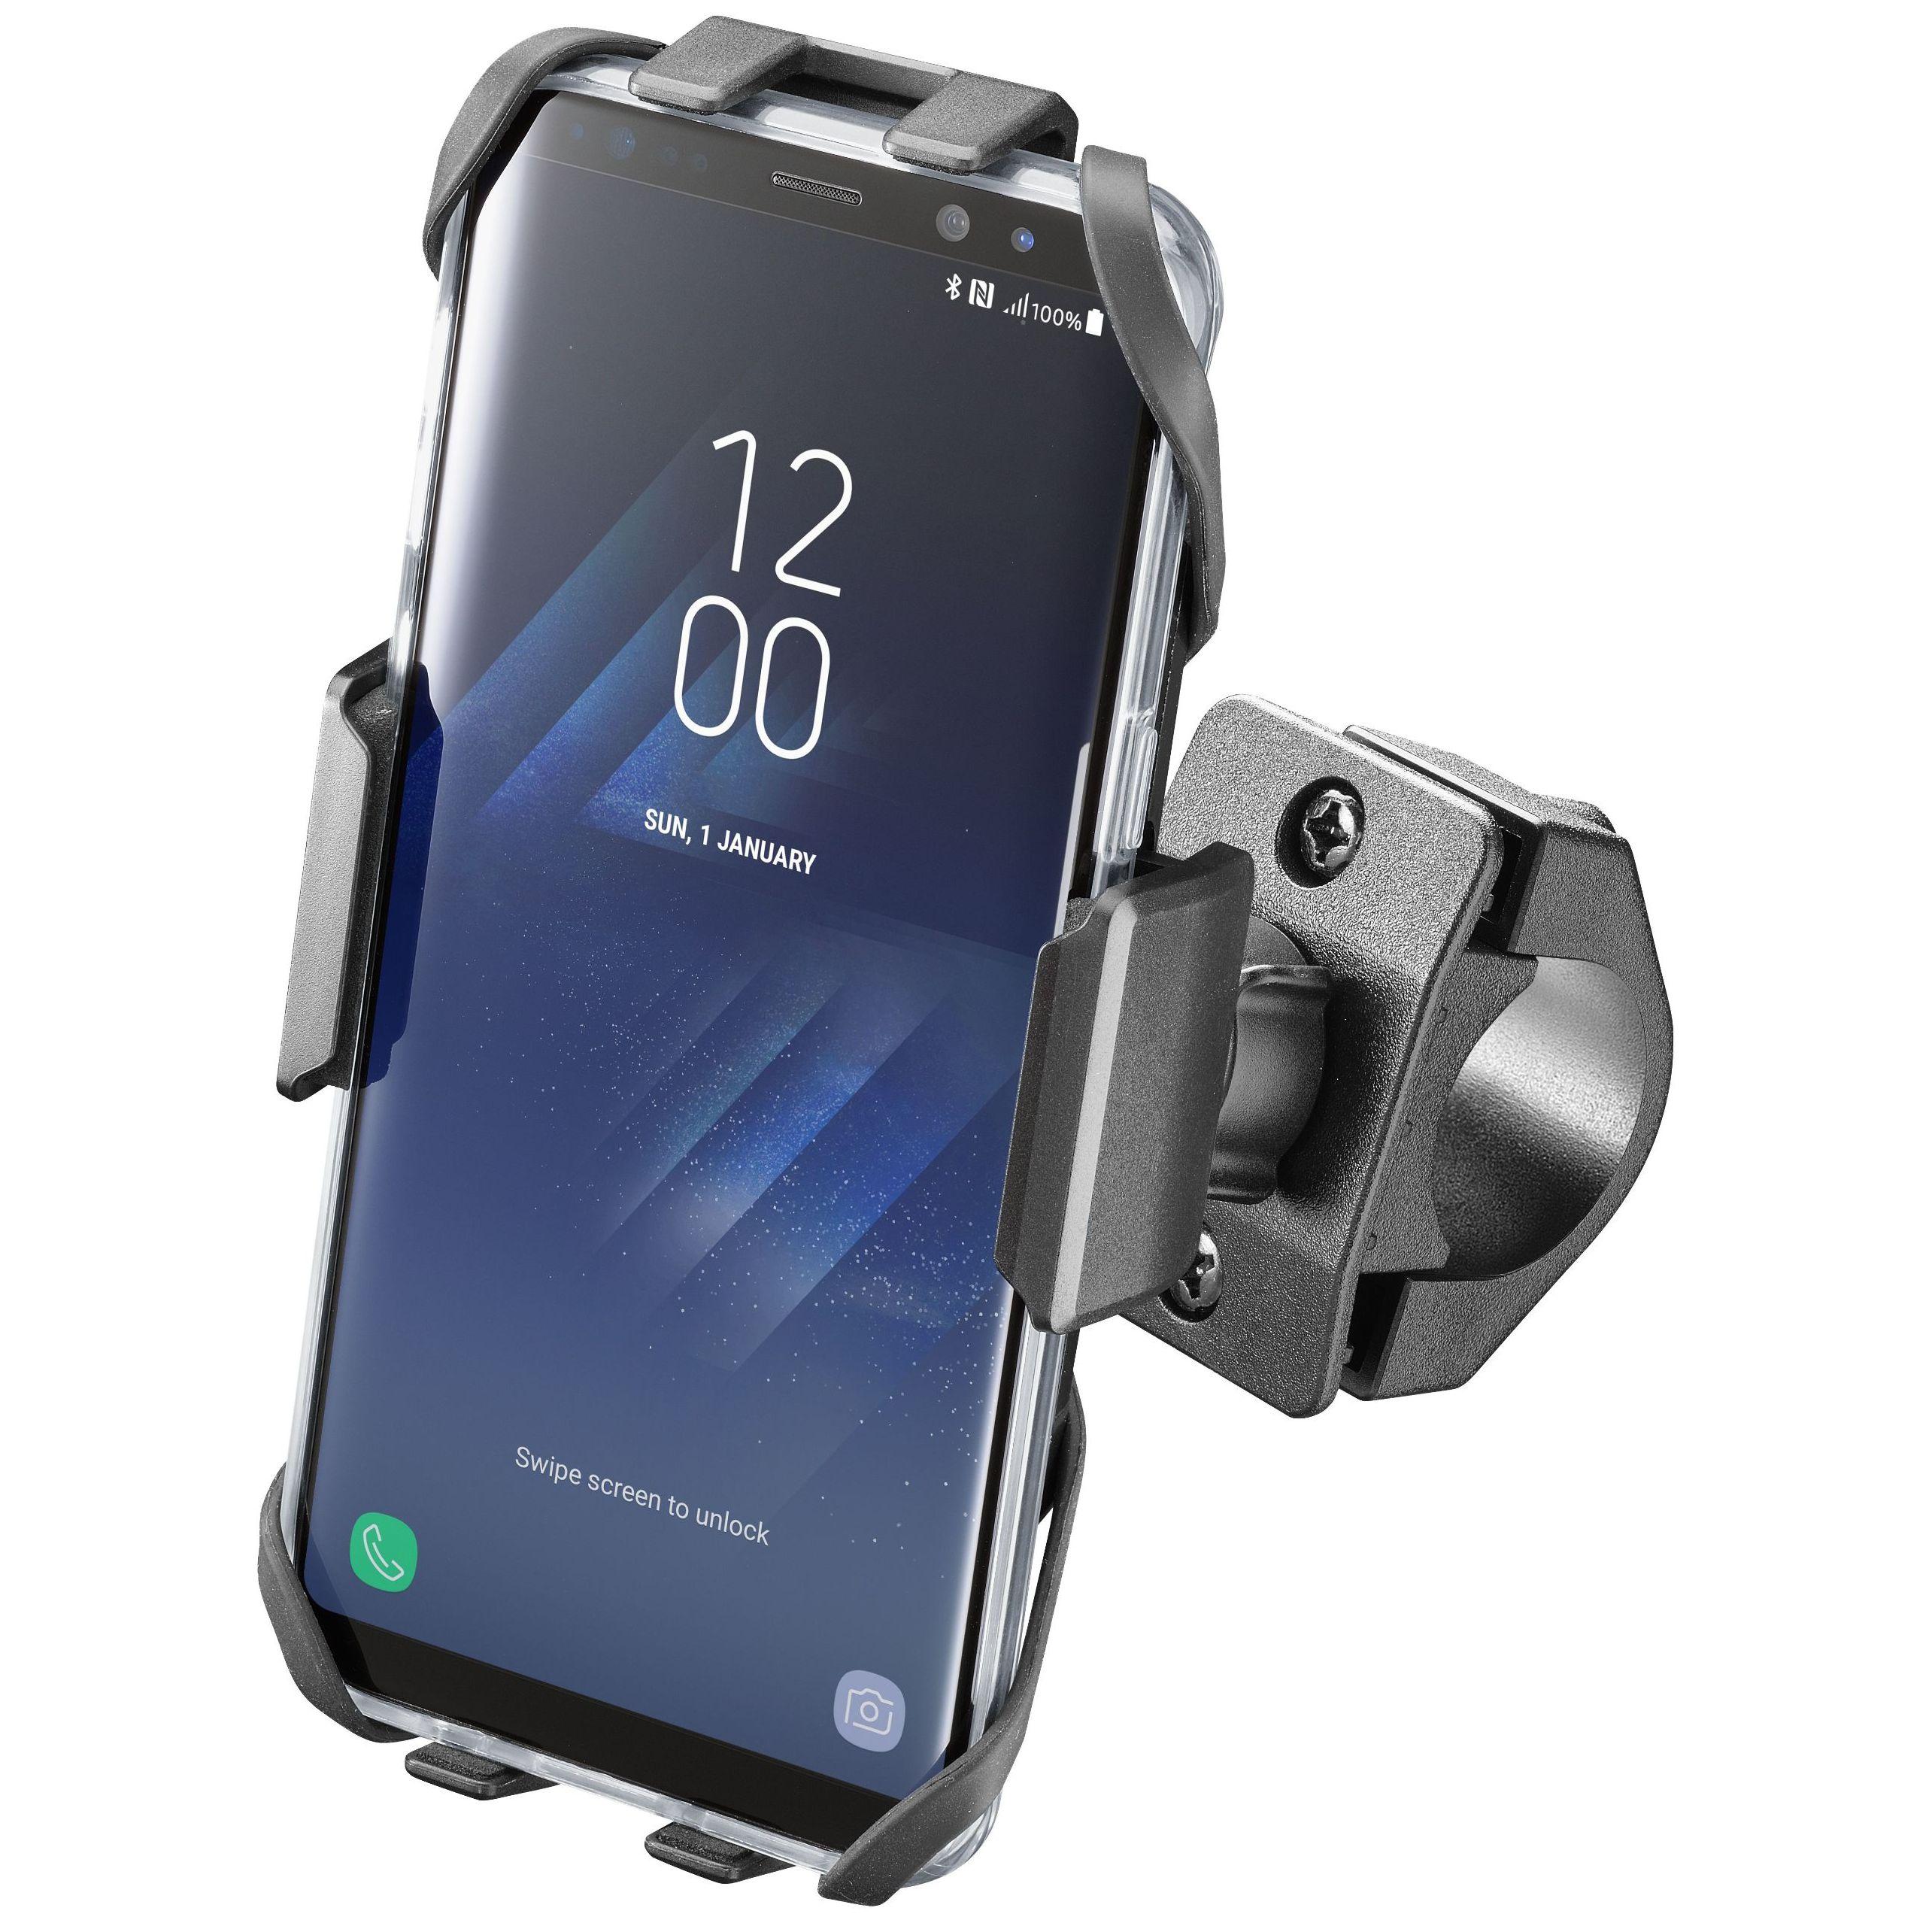 concha de protecci n cellular line carcasa smartphone con soporte moto crab high tech moto. Black Bedroom Furniture Sets. Home Design Ideas